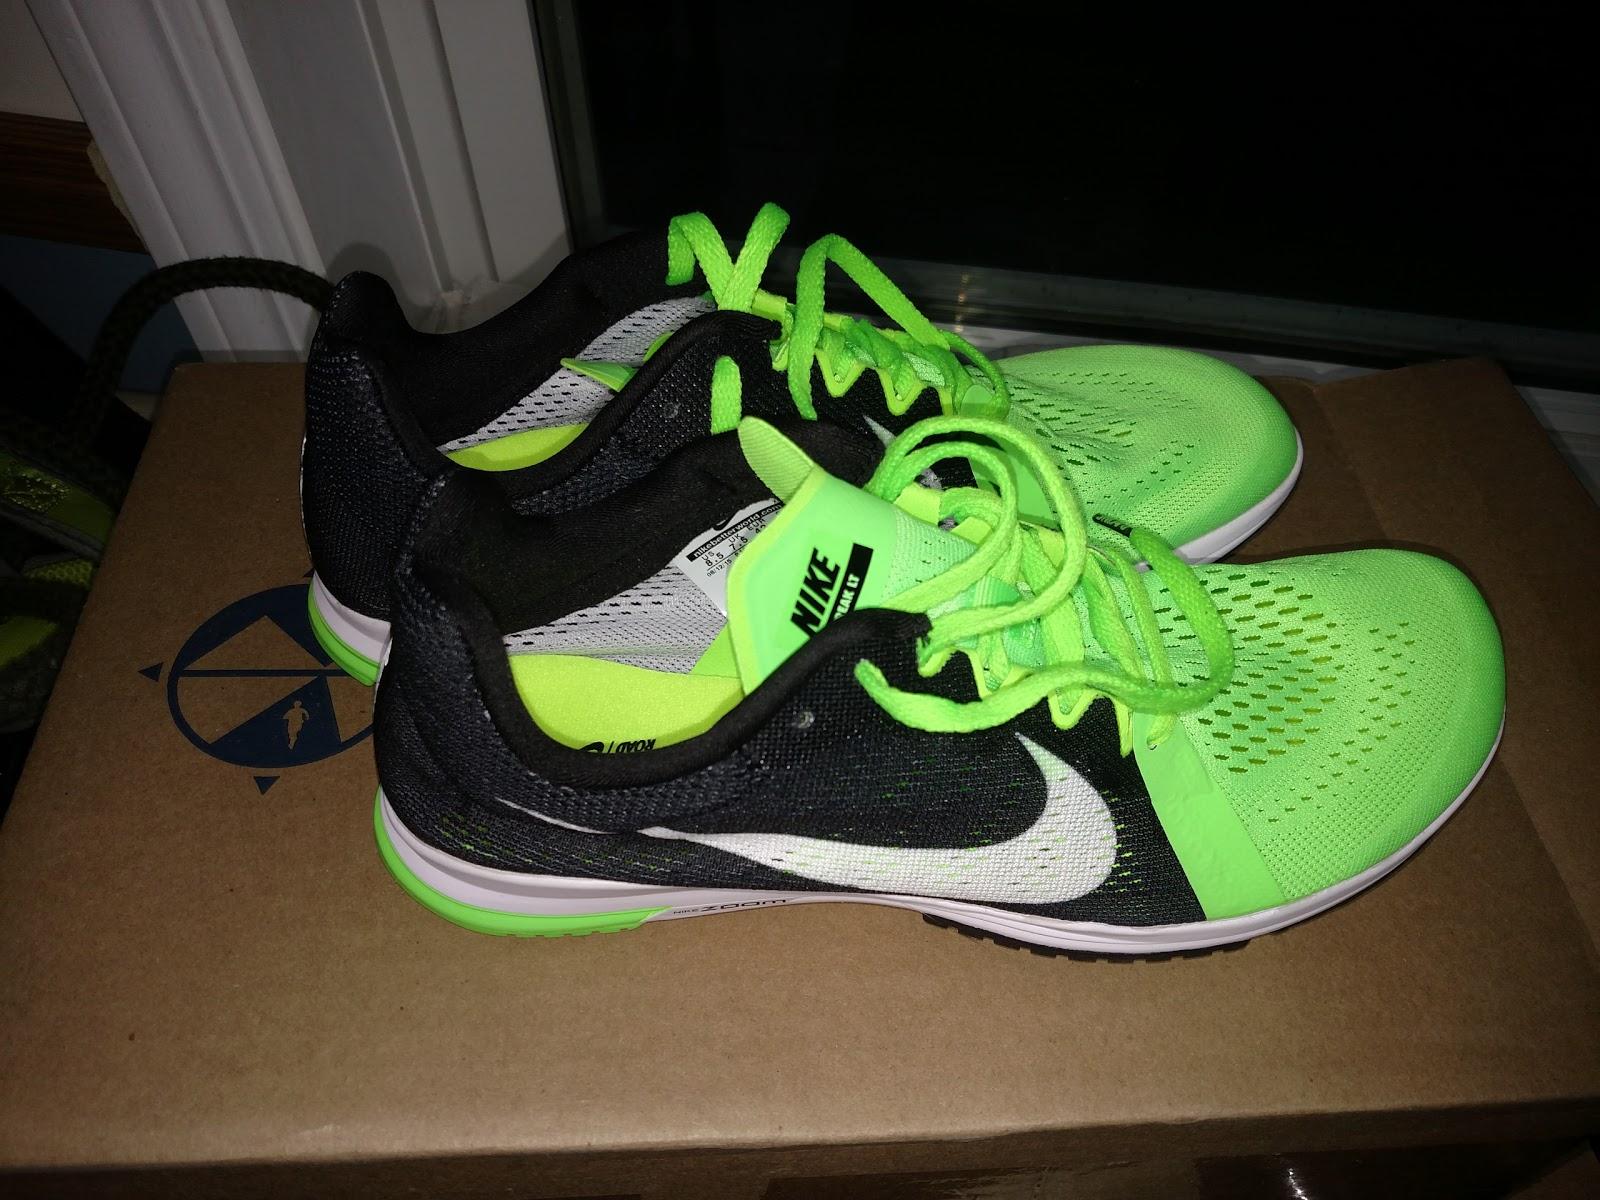 a131e032d893f Nike Zoom Streak 3 Weight